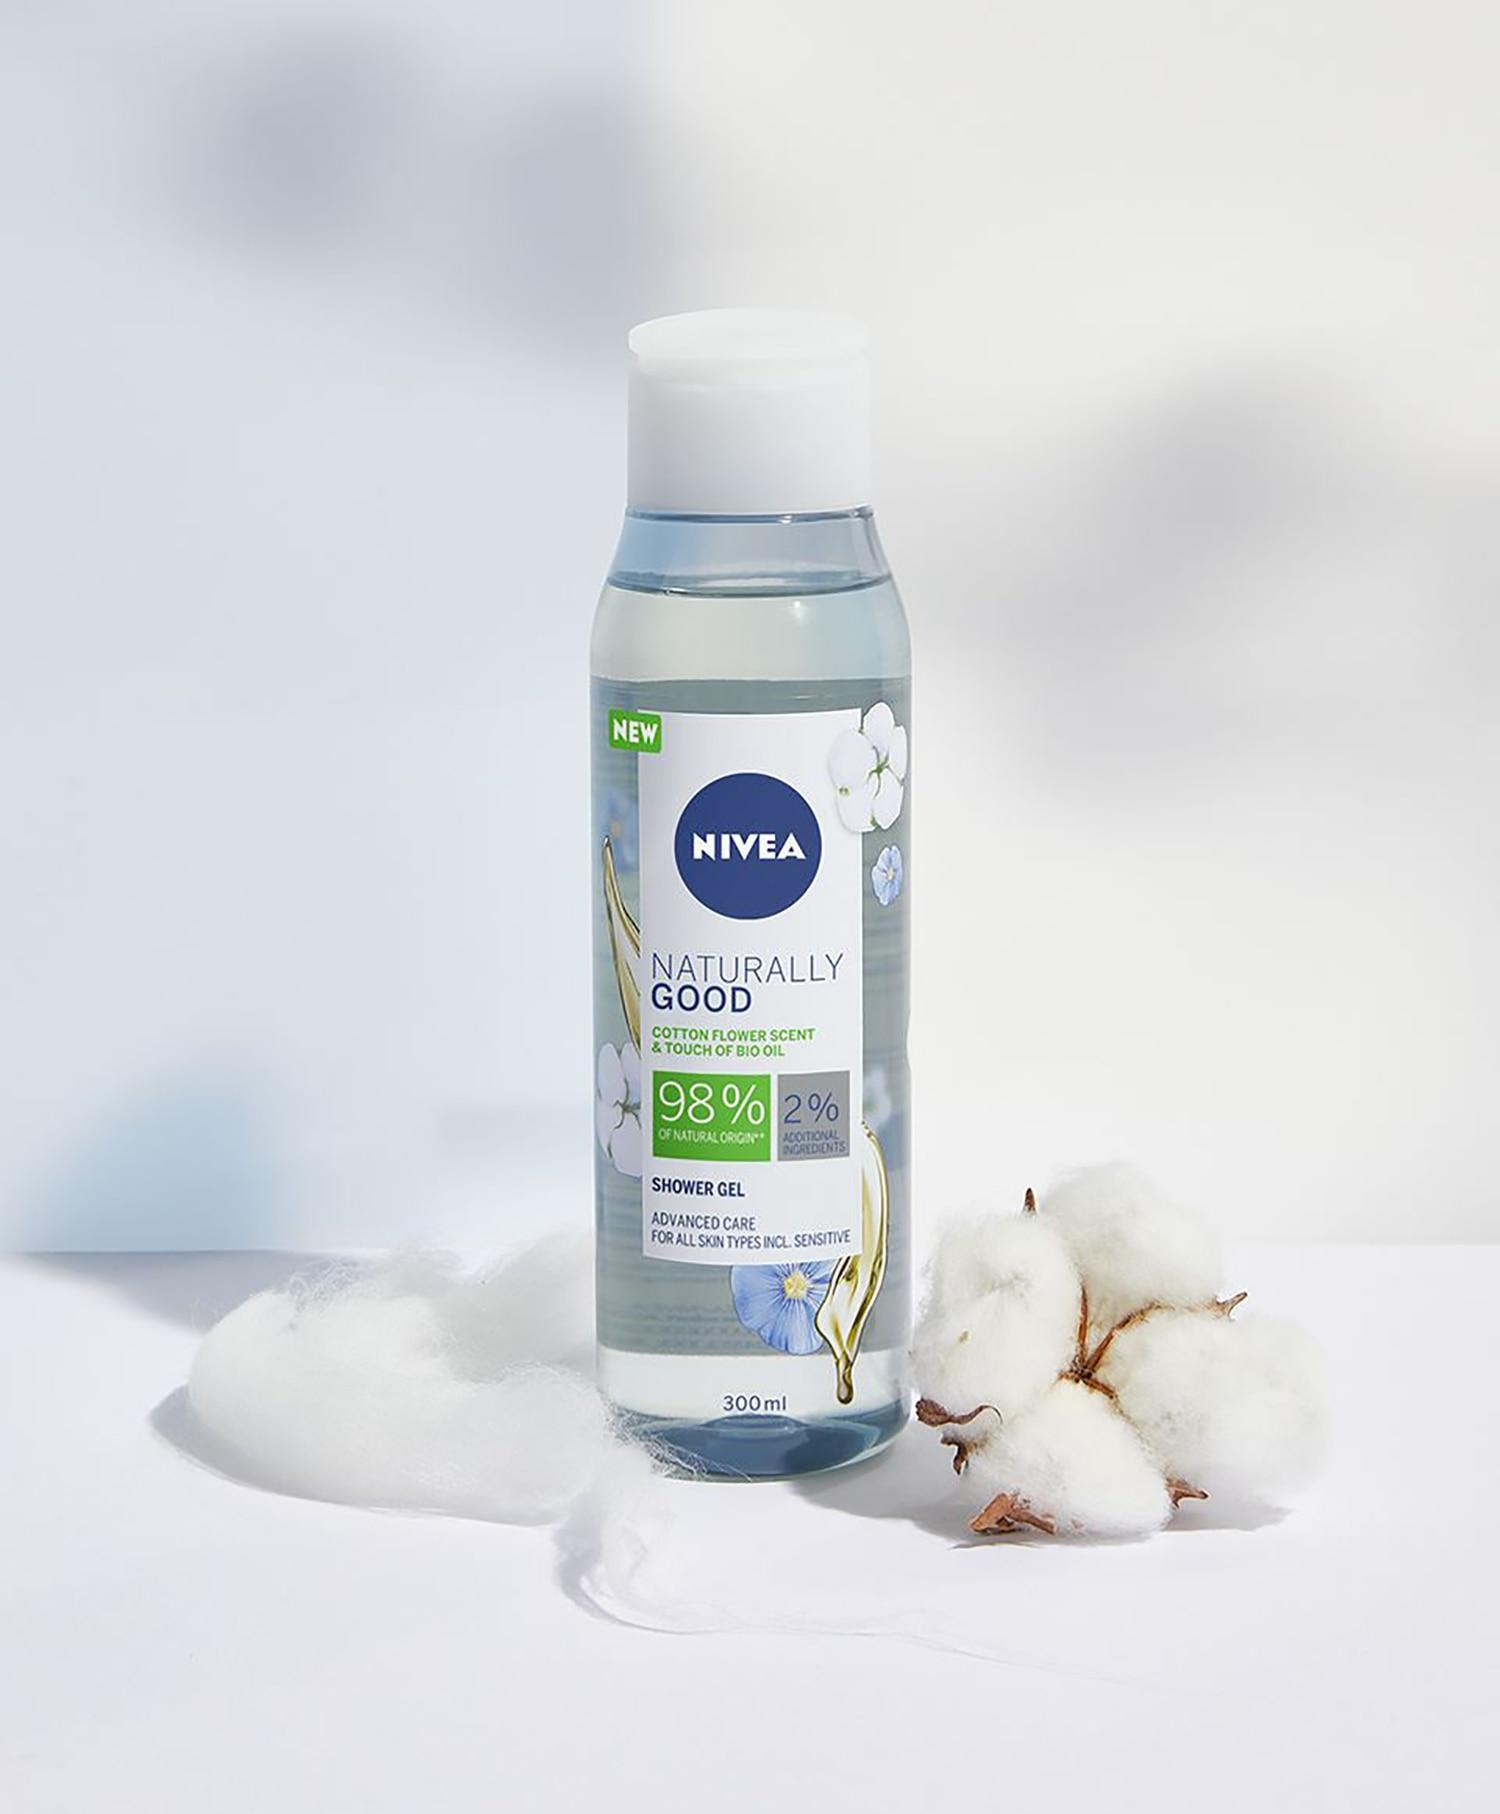 Nivea Shower Naturally Good Cotton